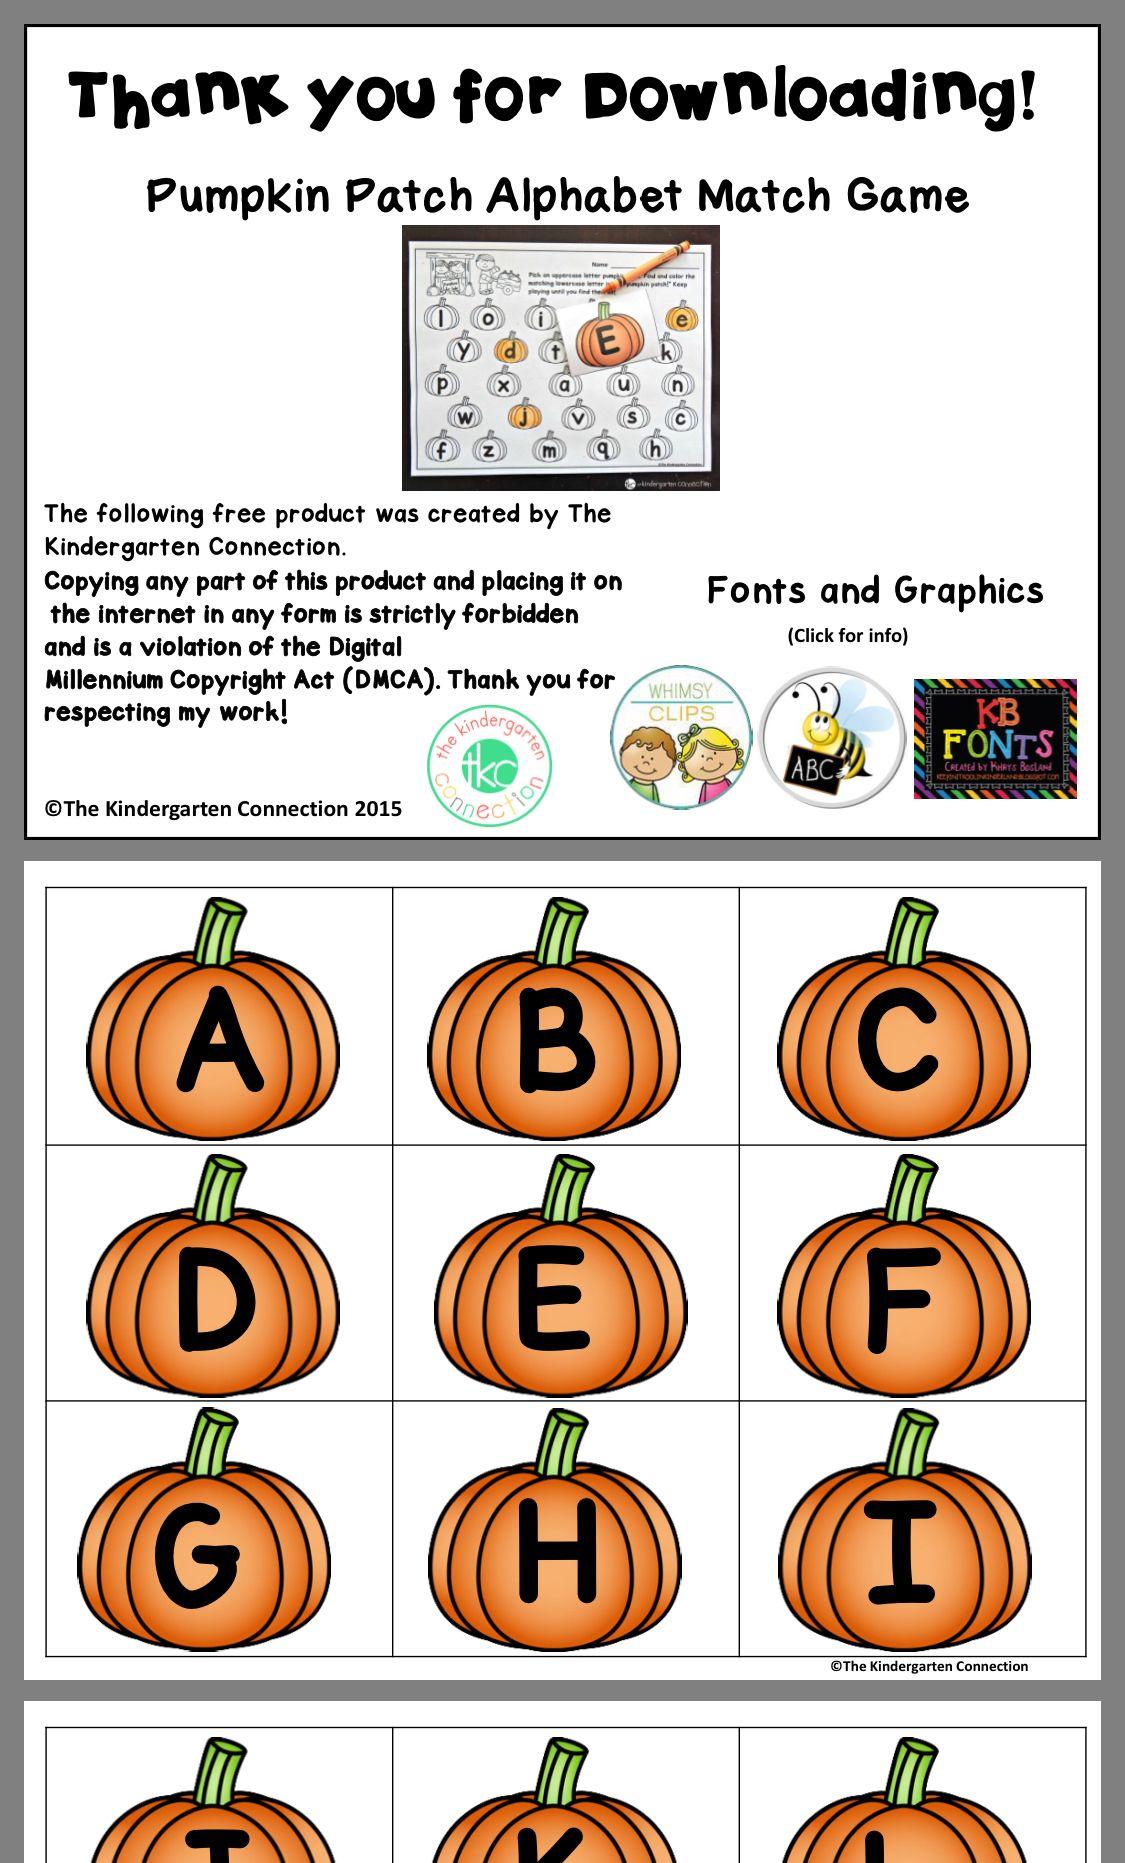 Pin By Juf Sofie On Ellie Pumpkins Kindergarten Alphabet Matching Alphabet Preschool [ 1863 x 1125 Pixel ]